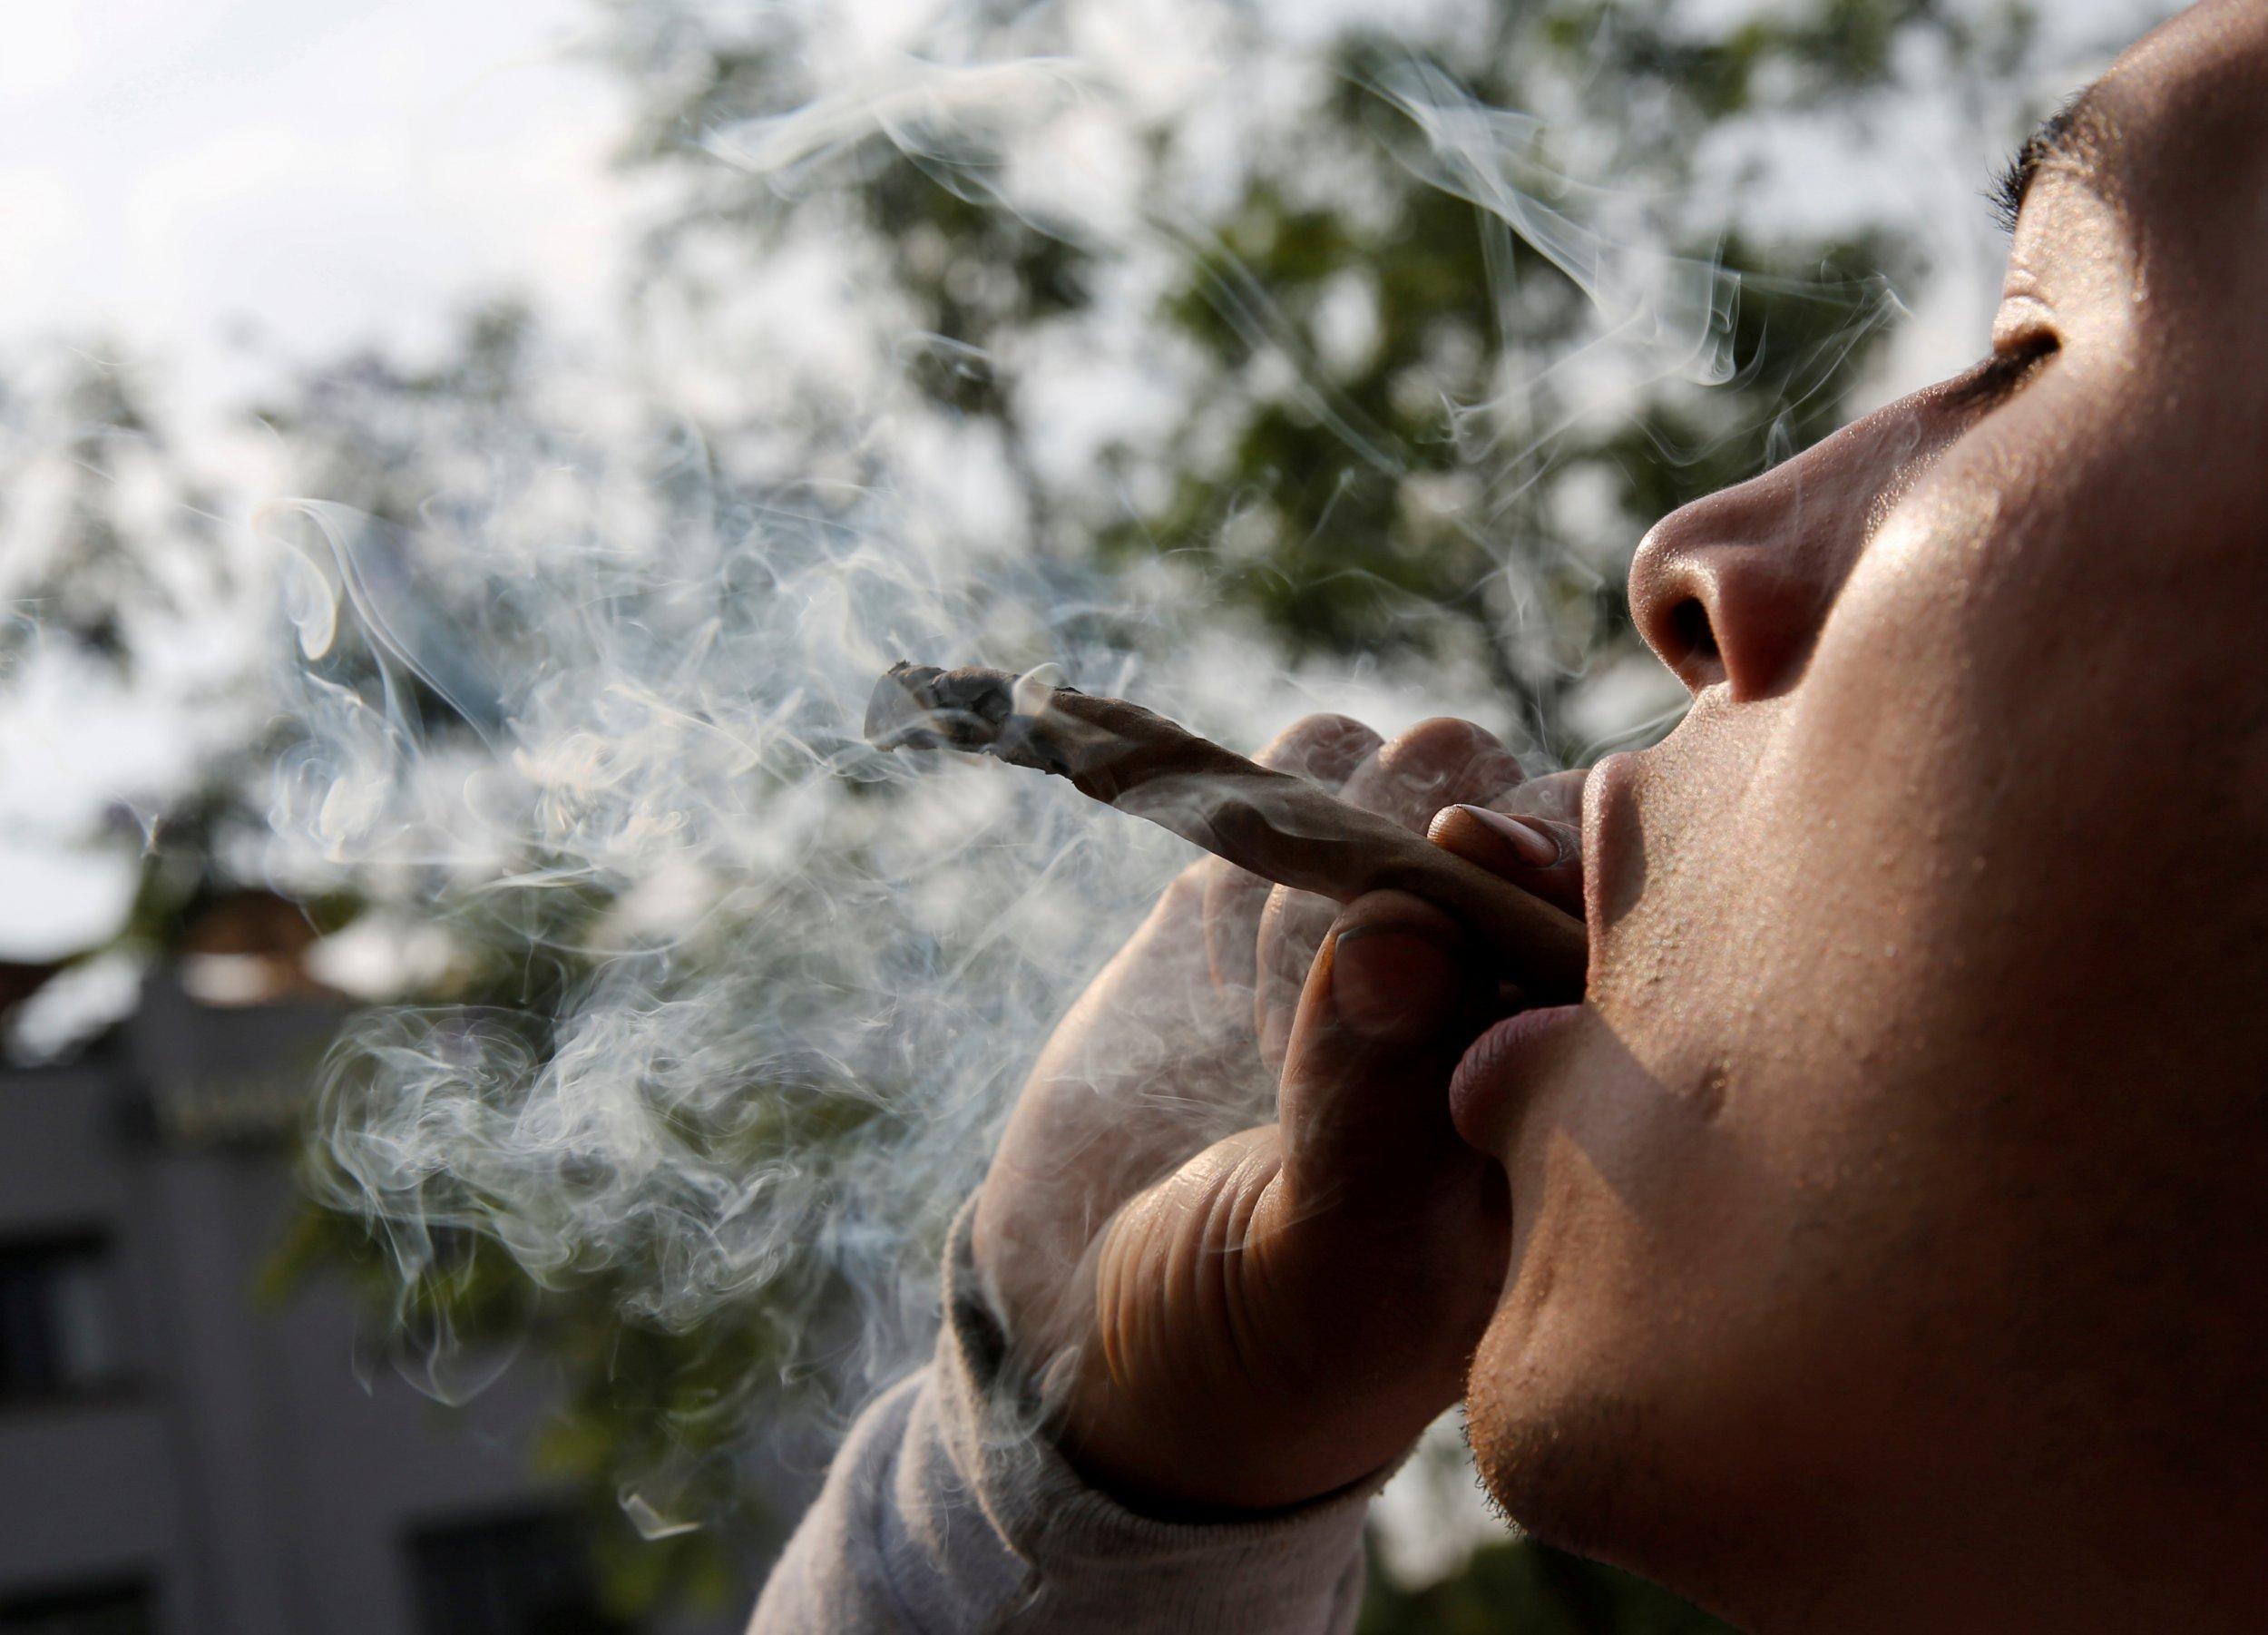 11_14_marijuana_craftbeer